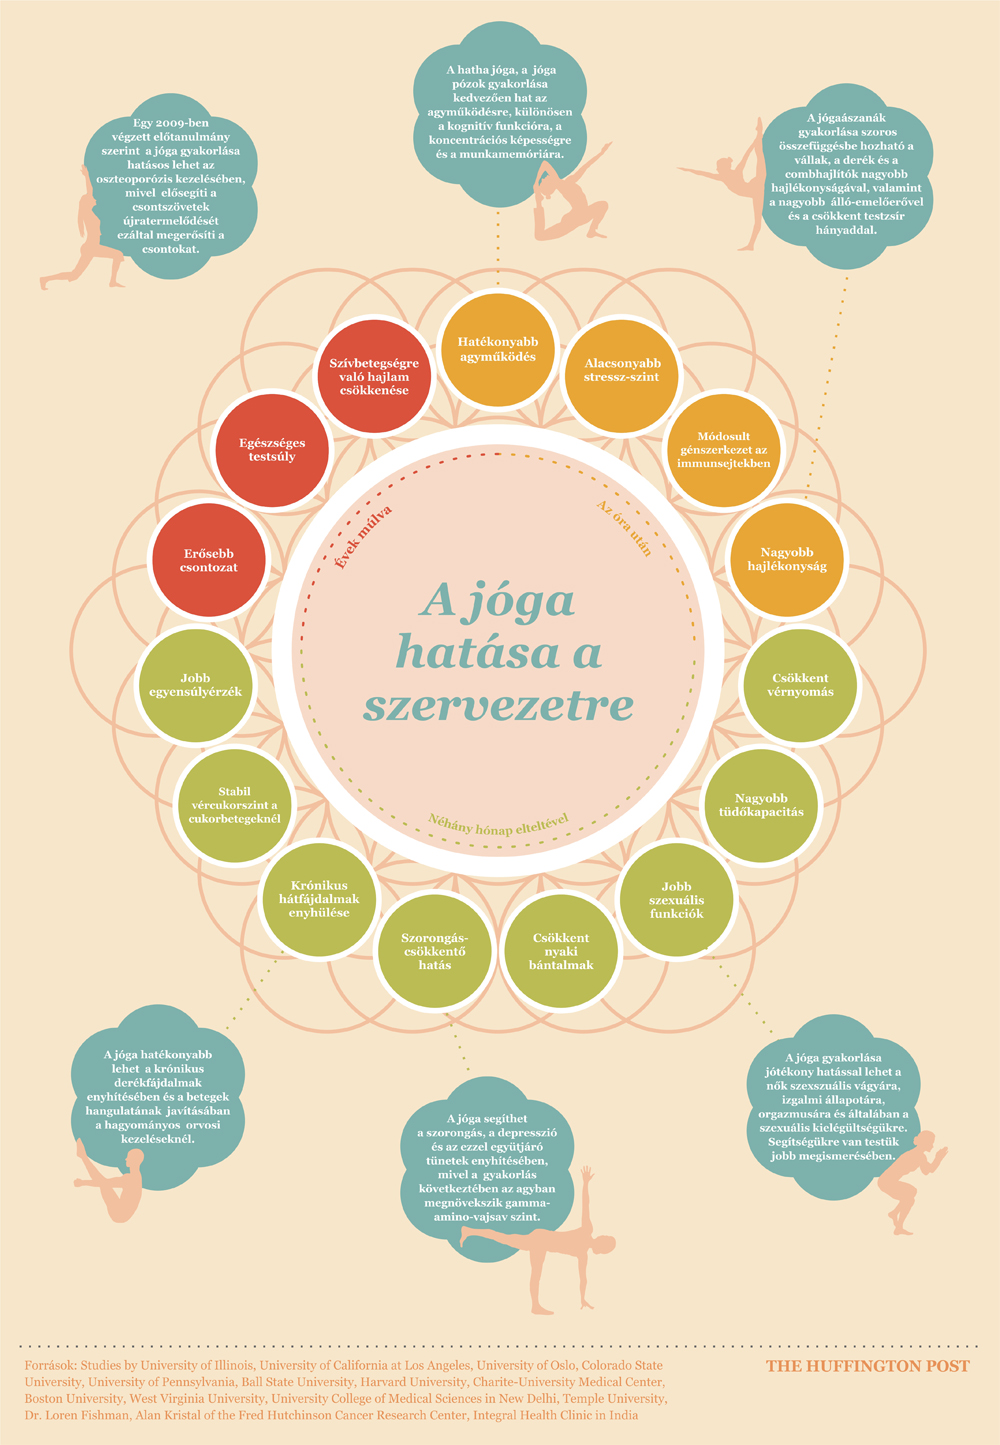 Yoga_infographic-medium.jpg